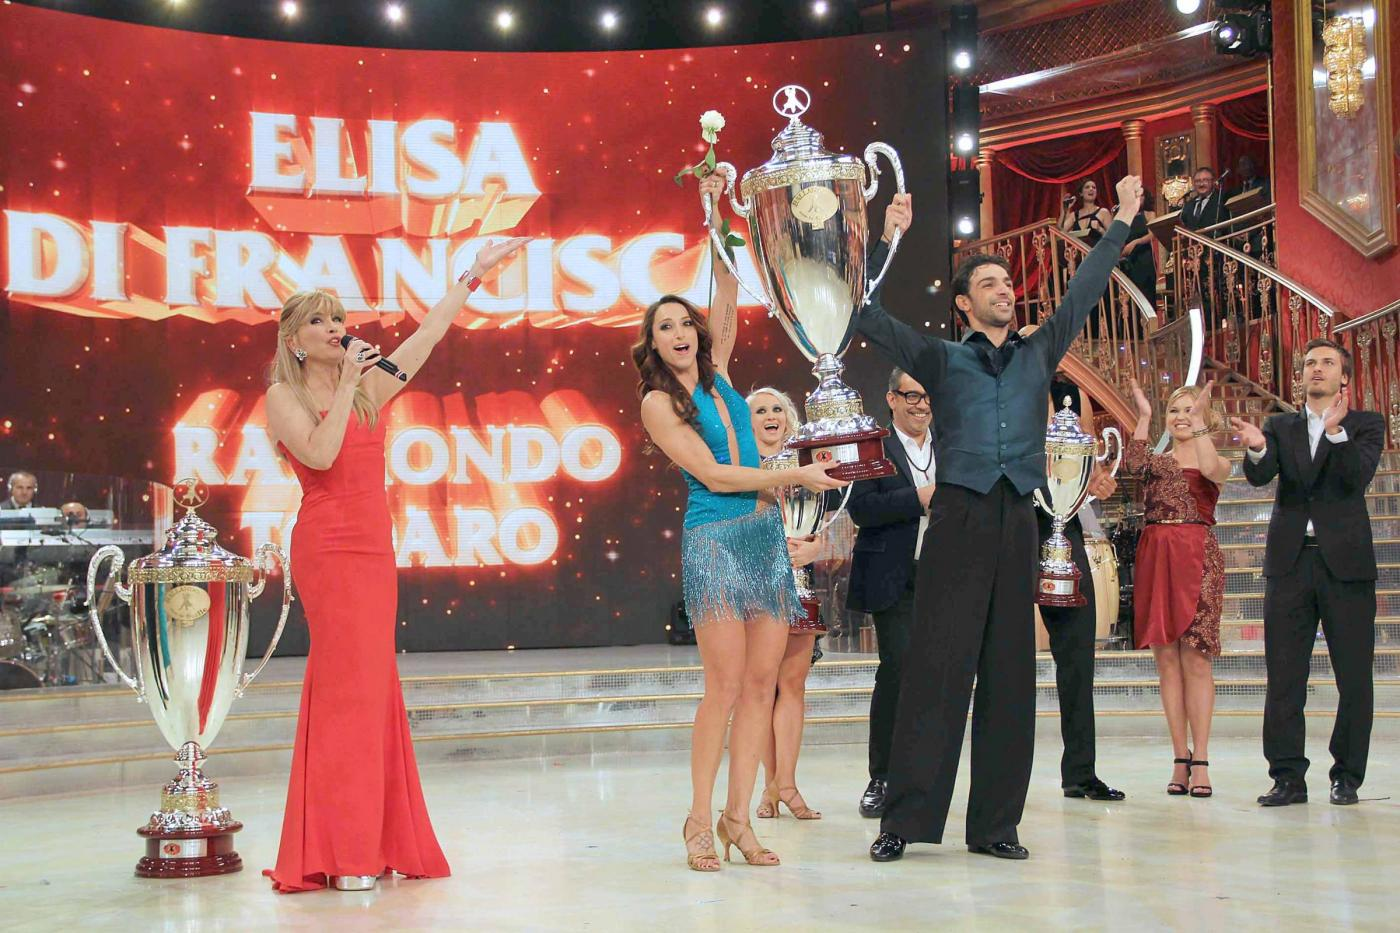 Ballando Con le stelle 2013 vince Elisa De Francisca04